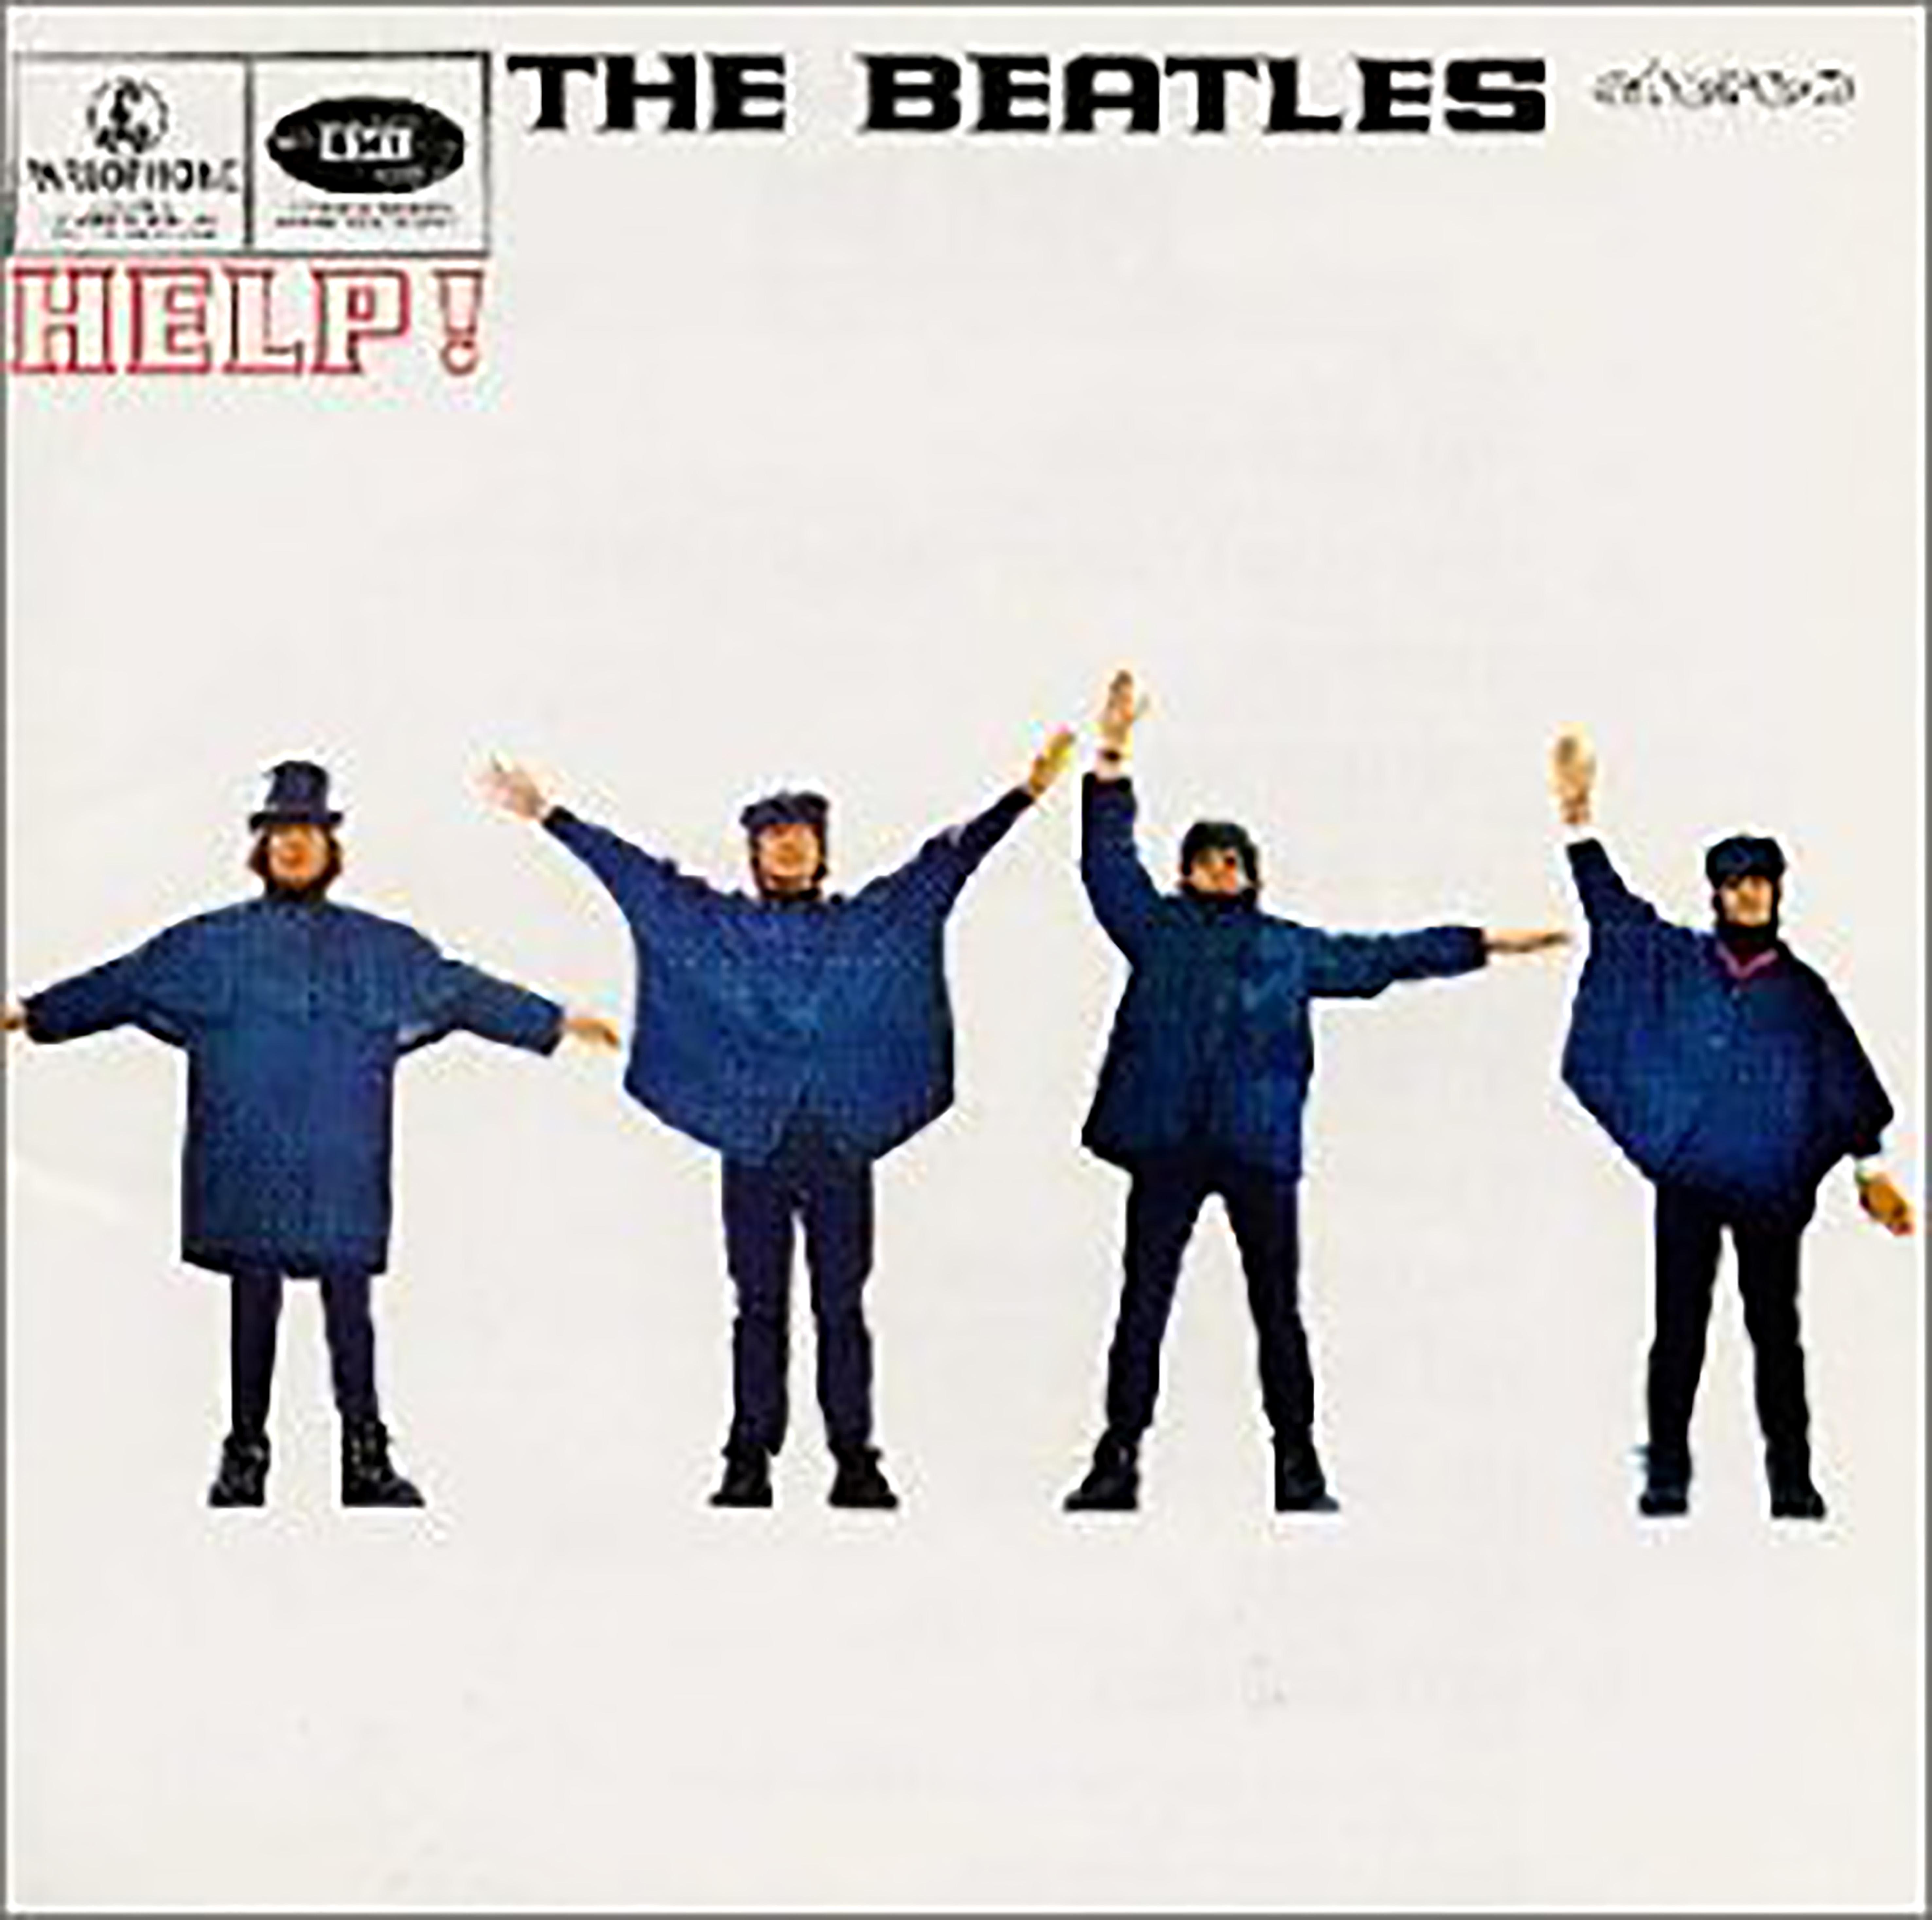 「Help!」収録アルバム『HELP! - 4人はアイドル』/The Beatles